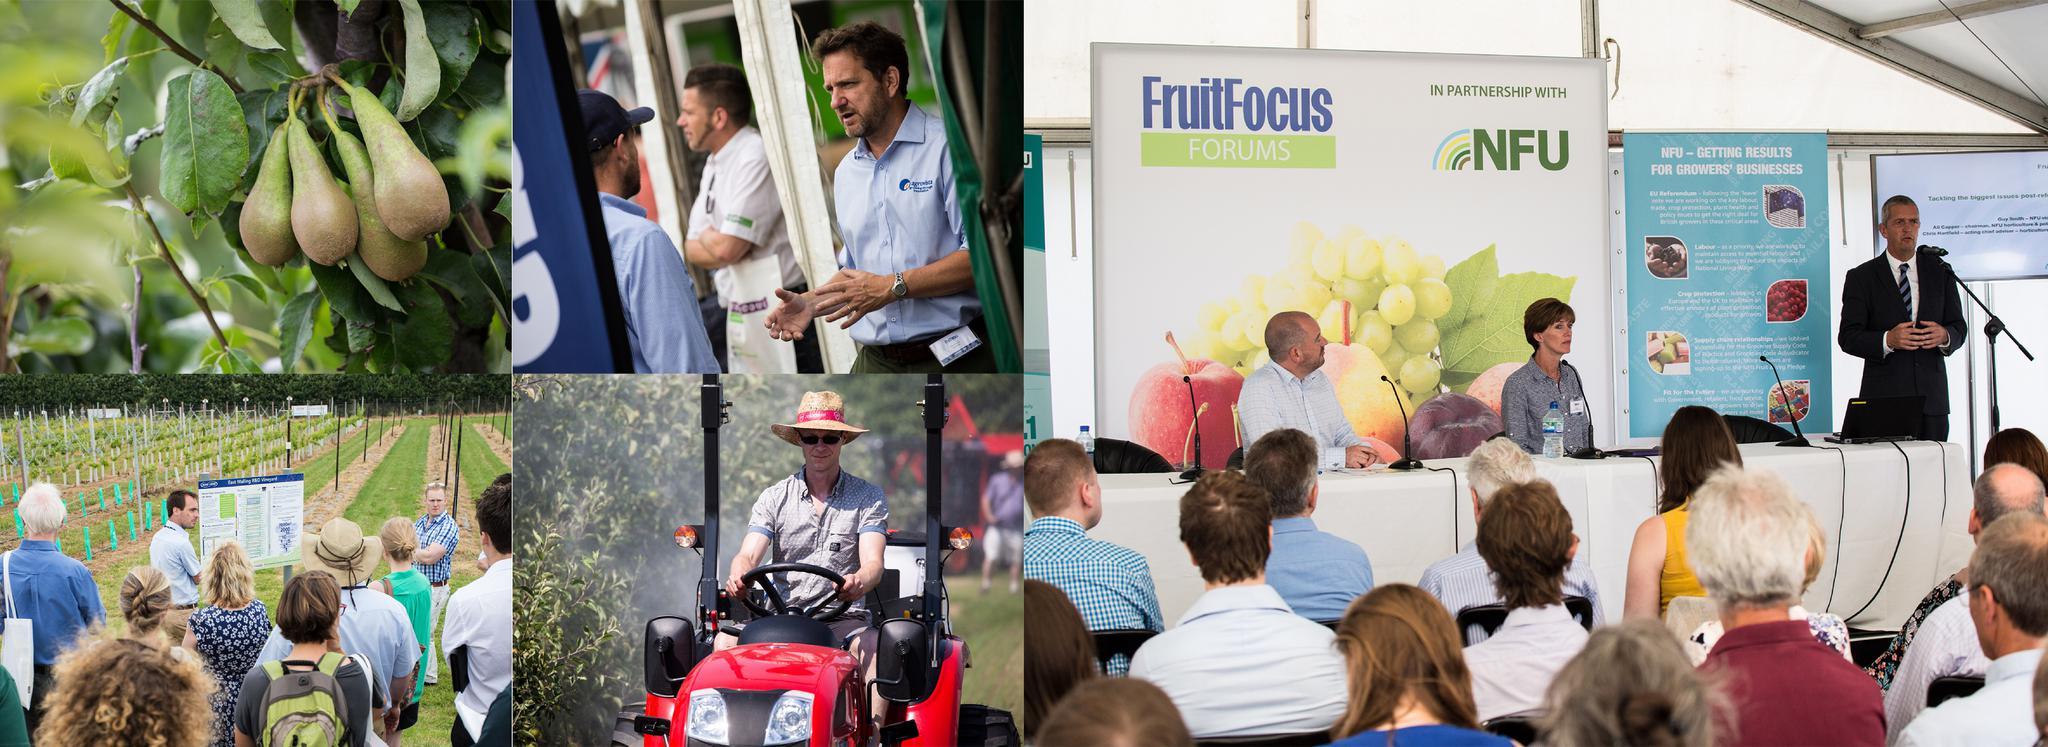 EndoSan exhibits at Fruit Focus 2017